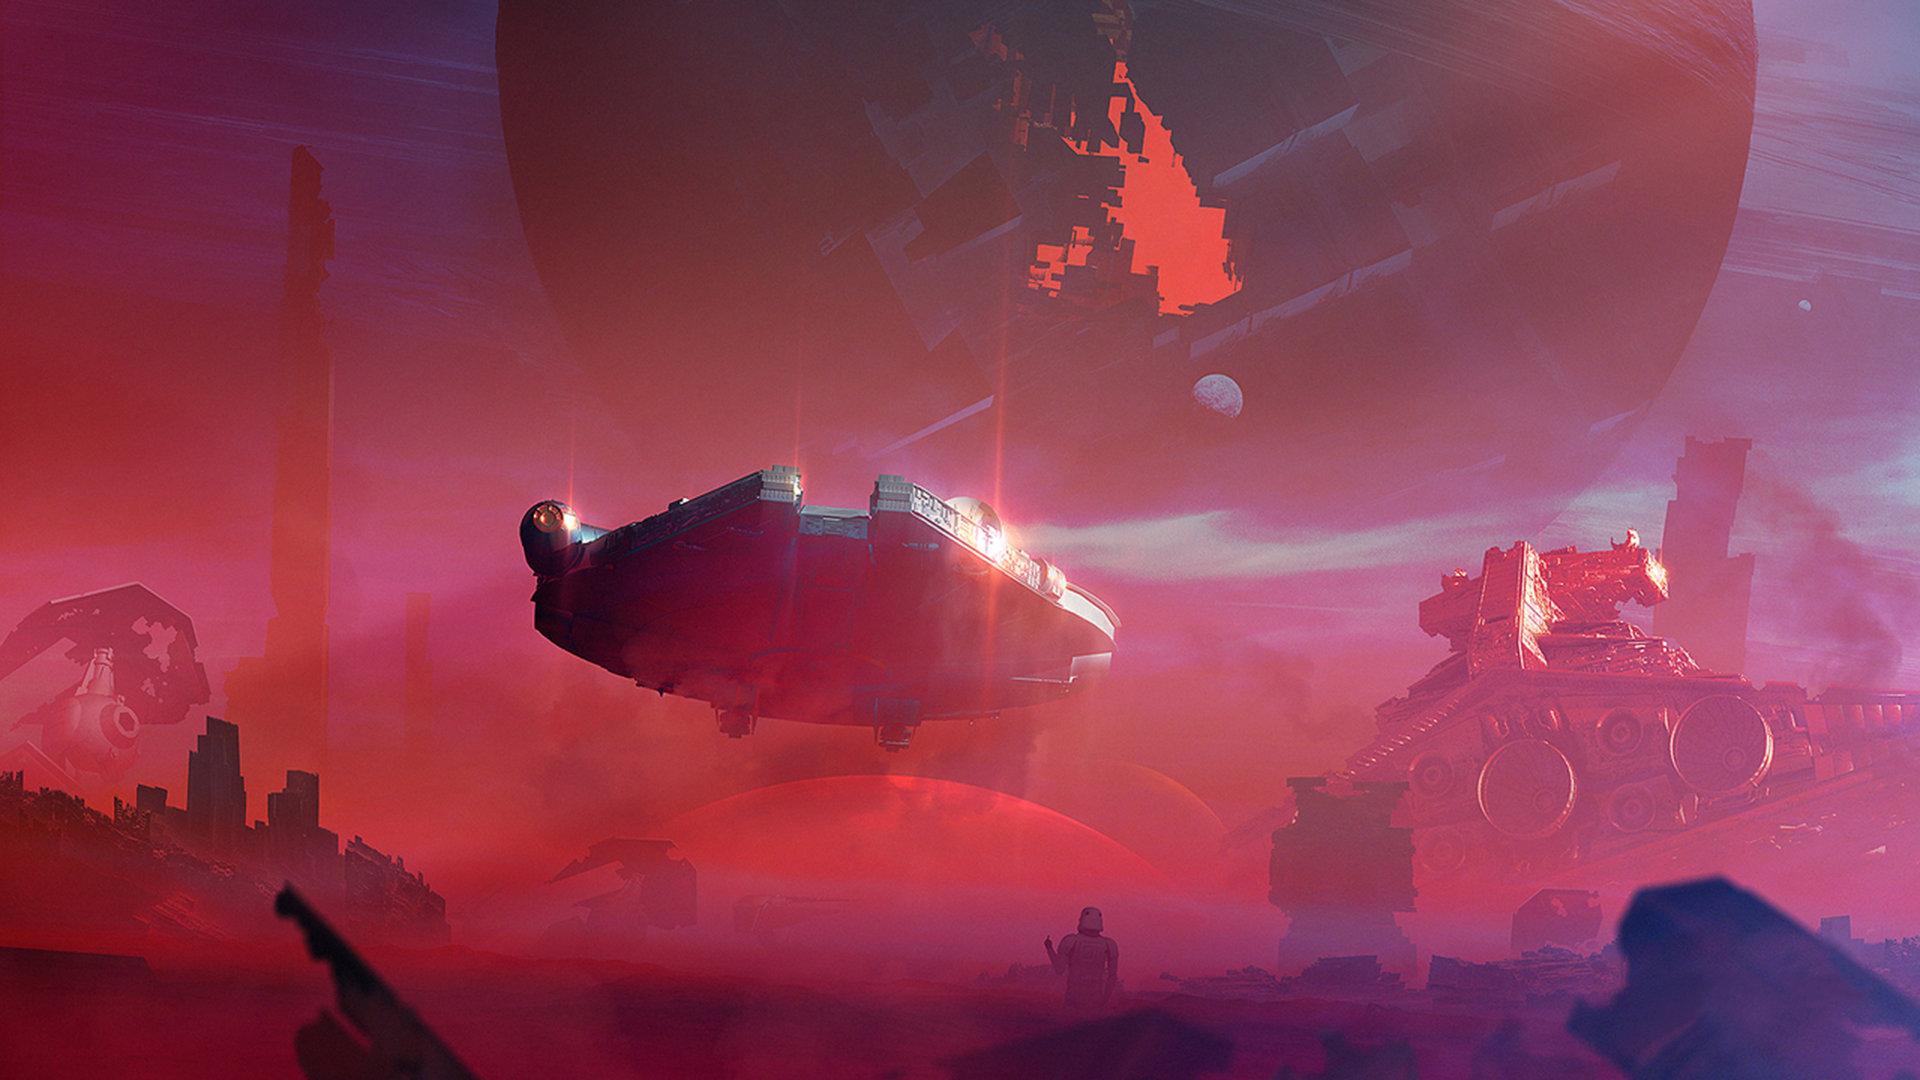 Star Wars Force Awakens 1080p: Millennium Falcon Wallpapers HD For Desktop Backgrounds